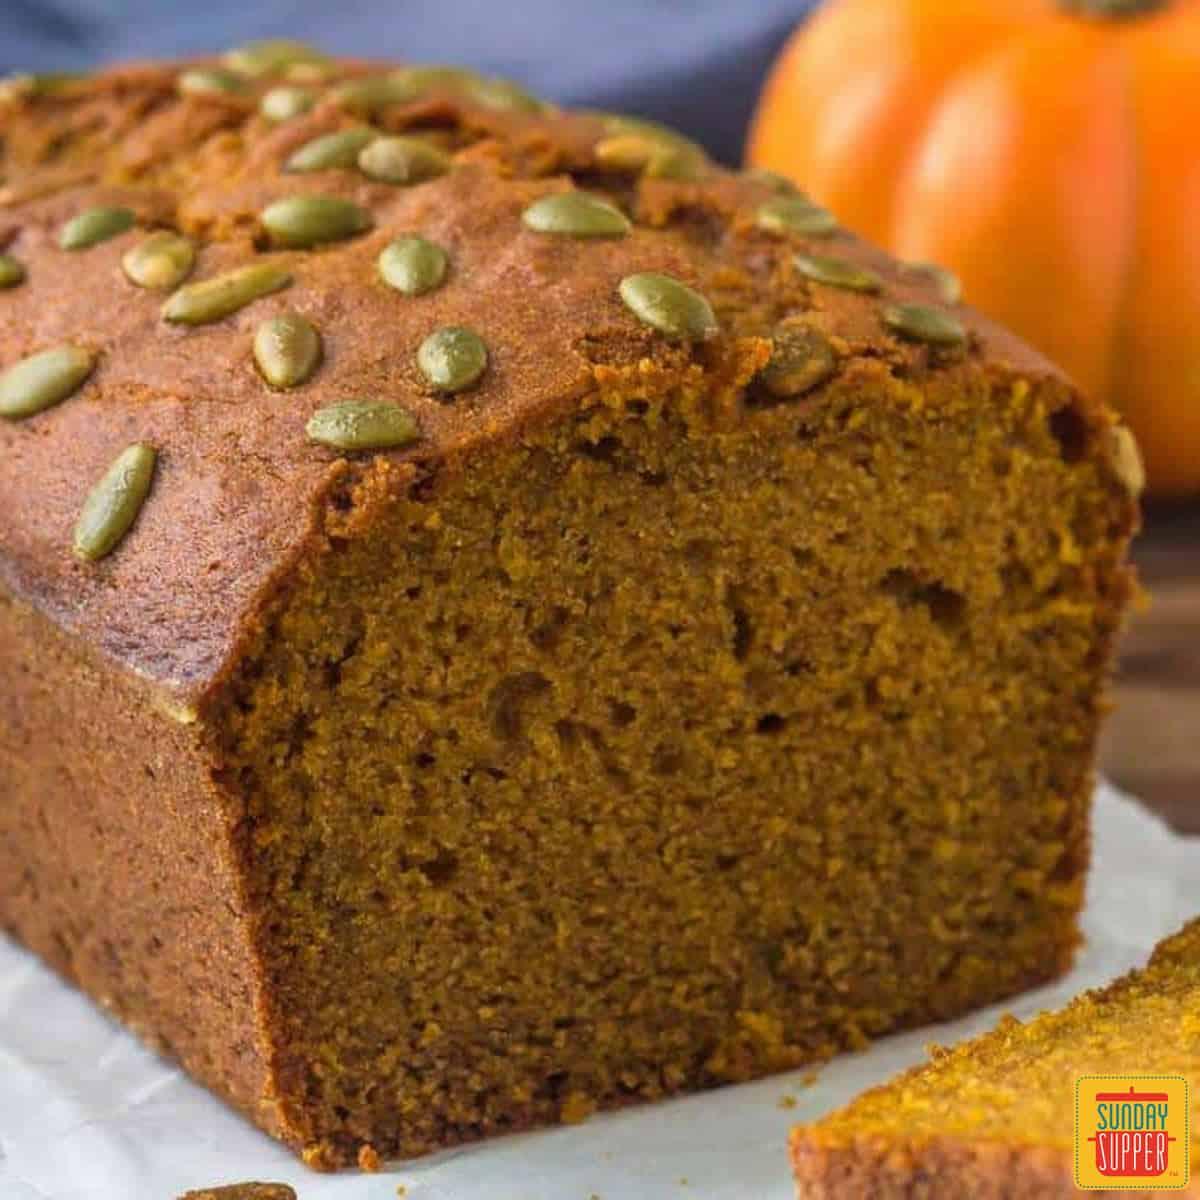 Starbucks pumpkin bread loaf with pumpkin seeds on top